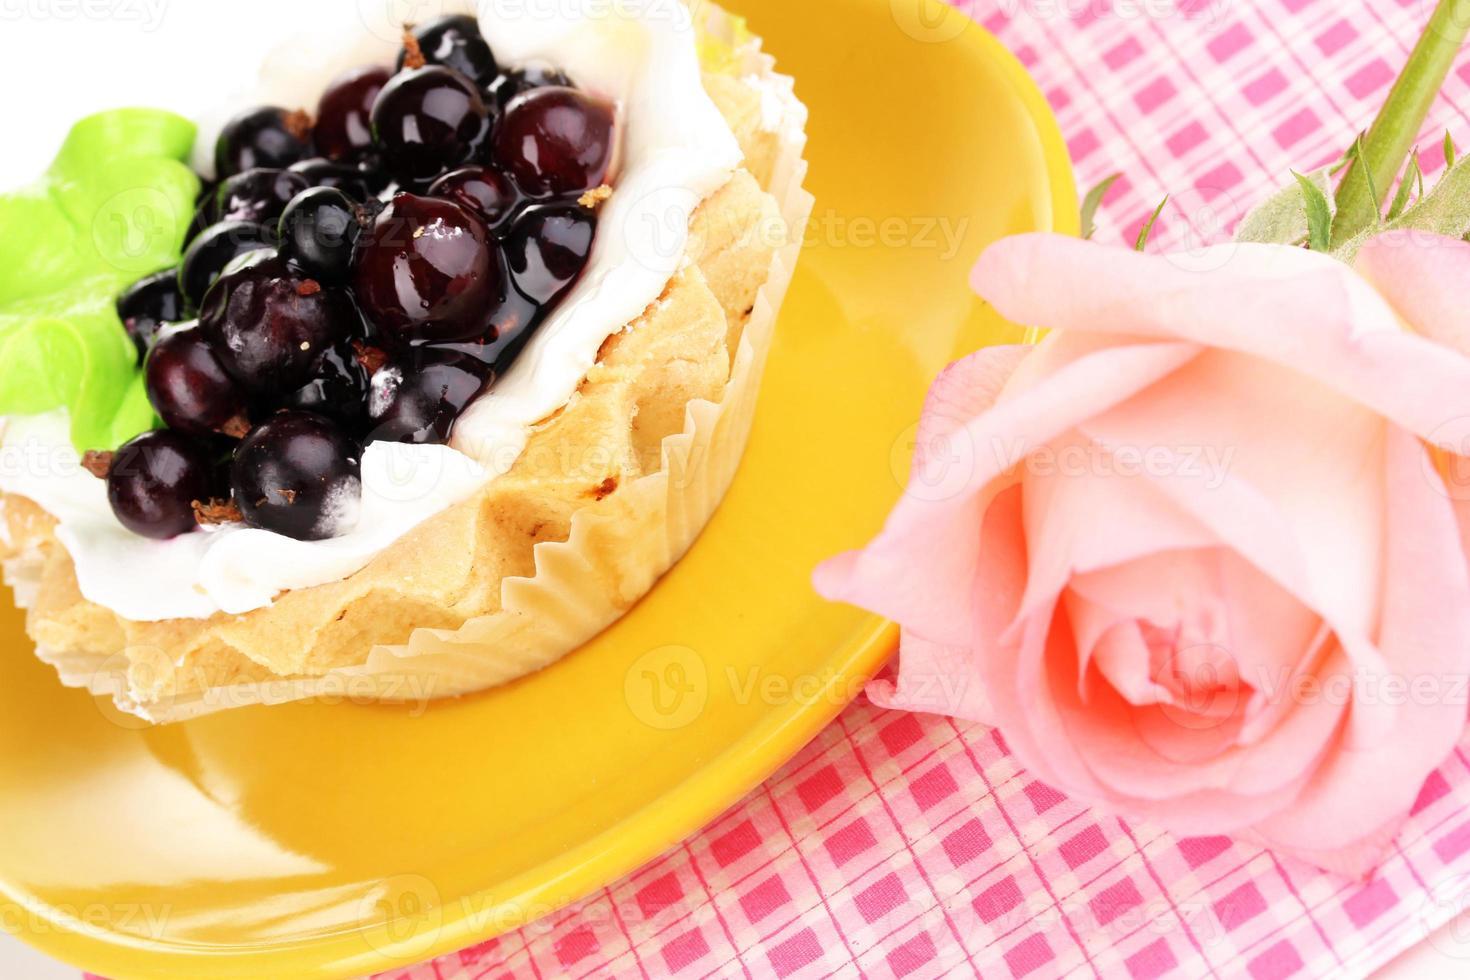 torta dolce con una tazza di tè close-up foto